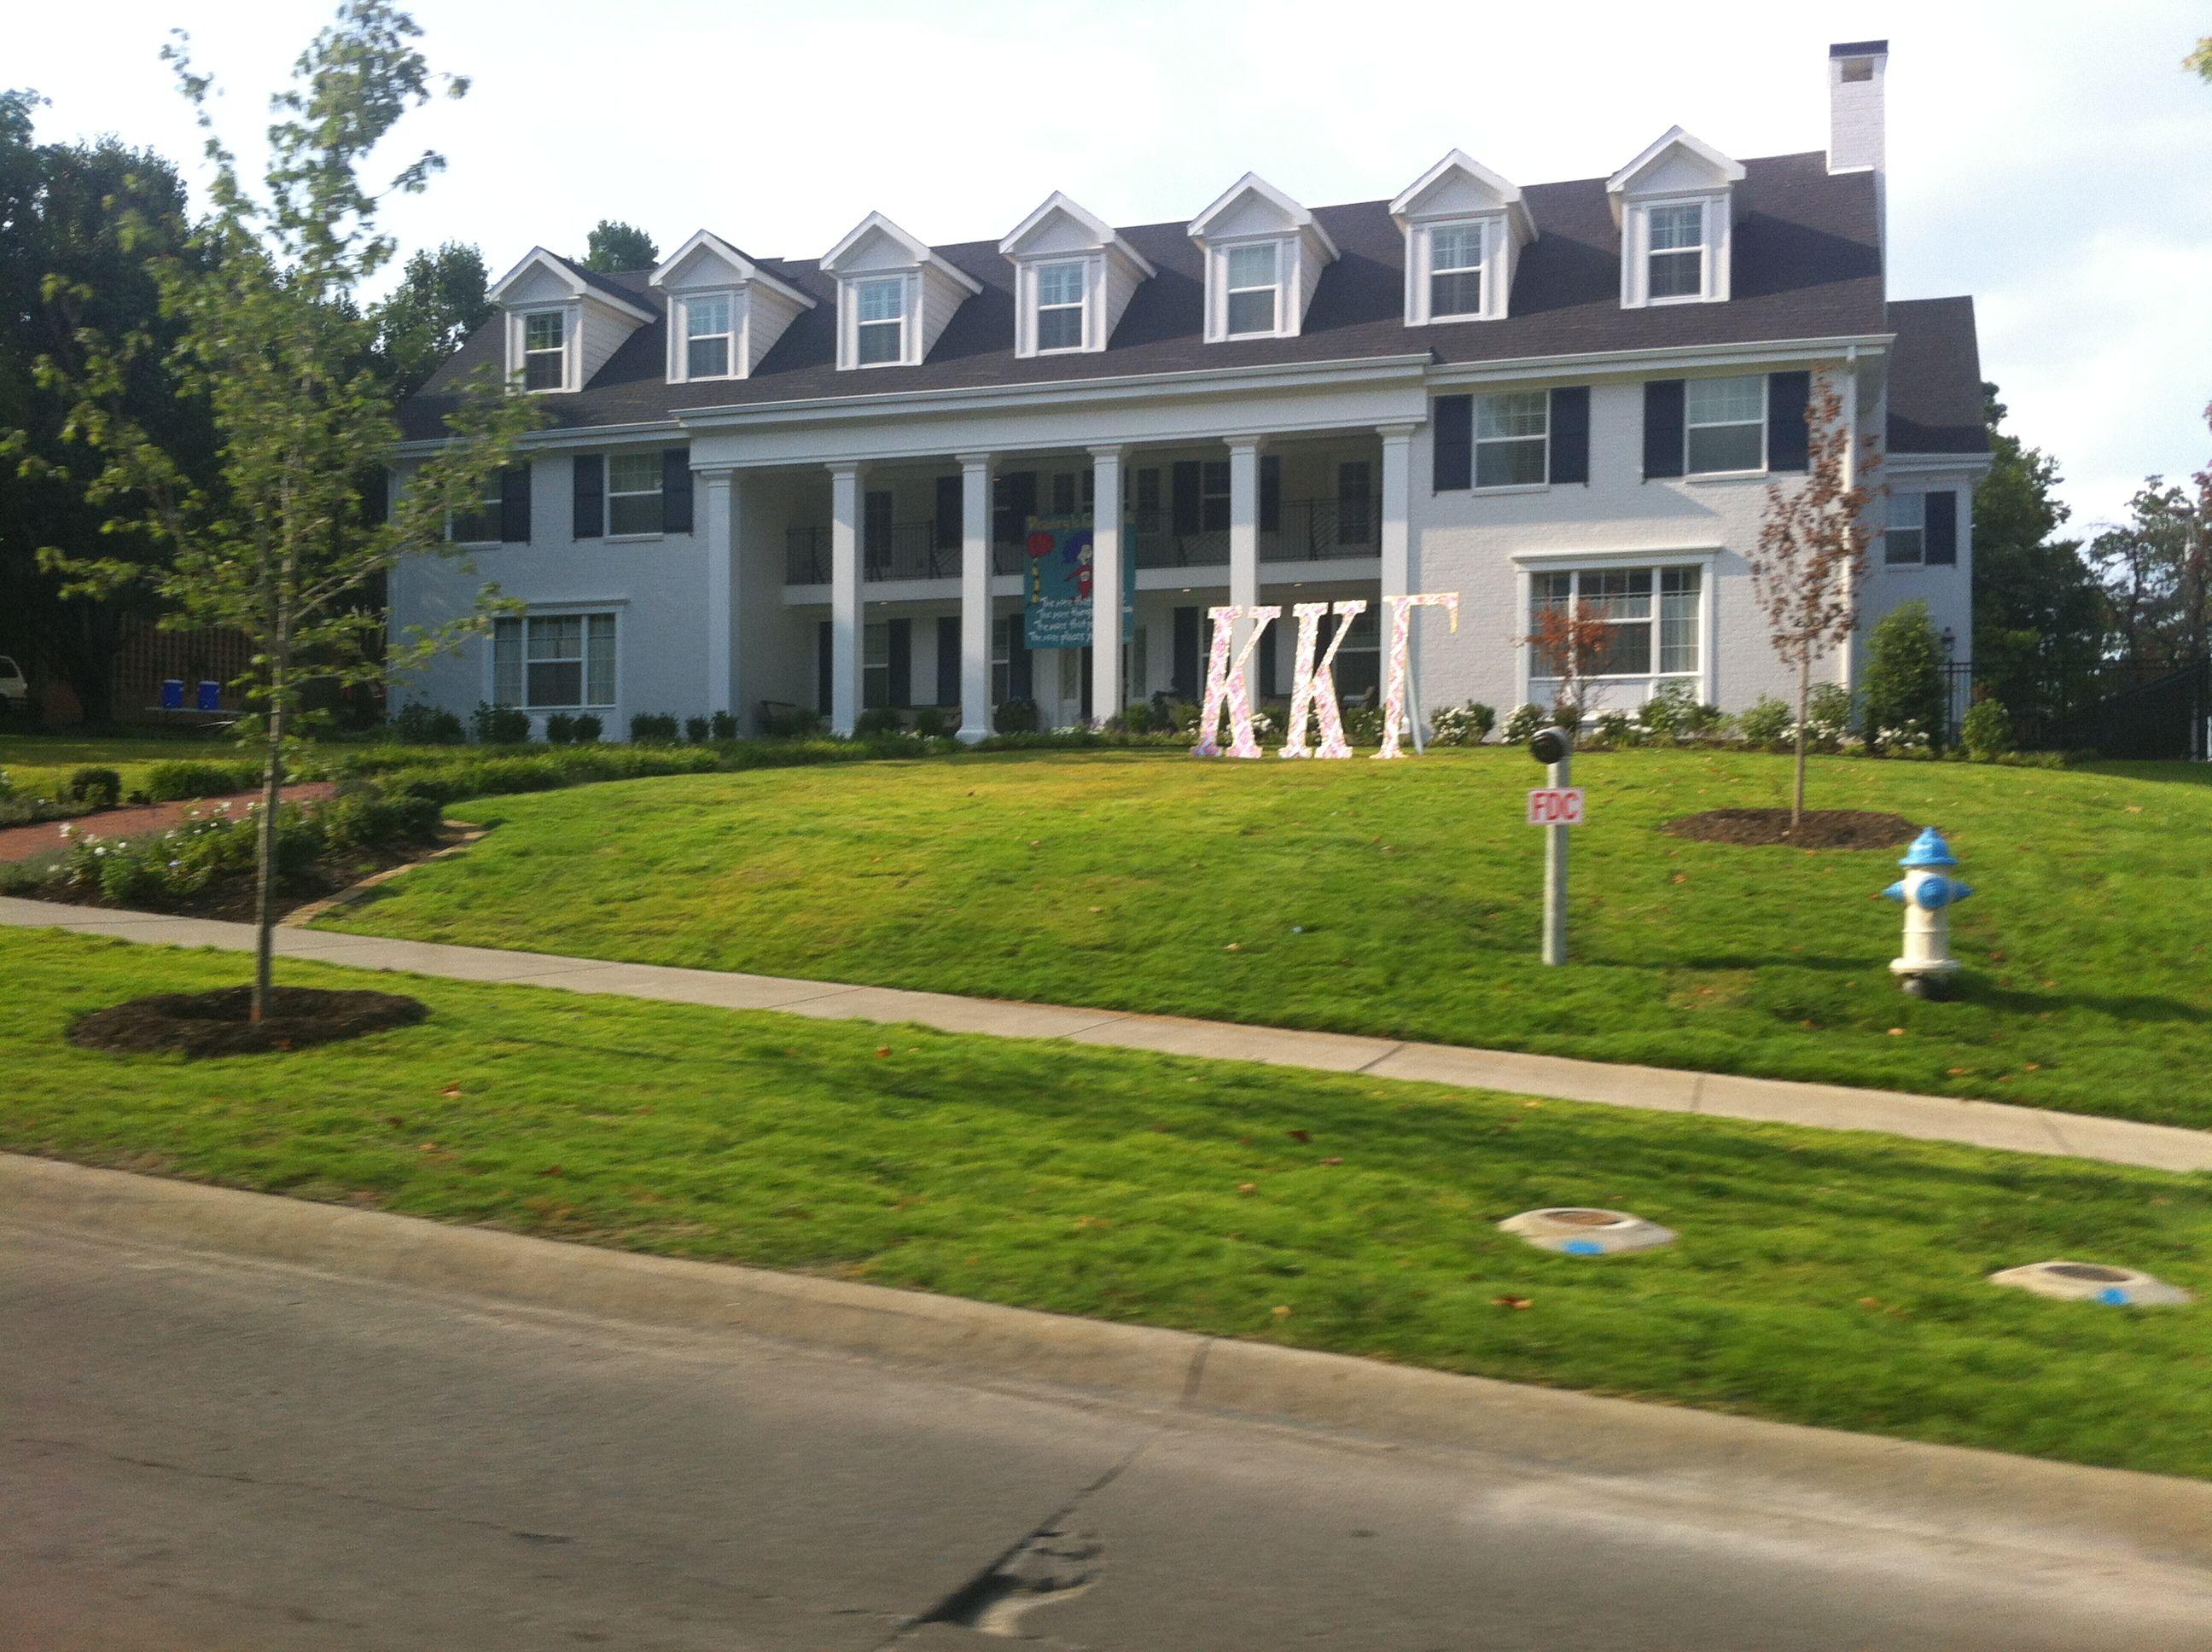 kappa kappa gamma house at Arkansas House styles, House